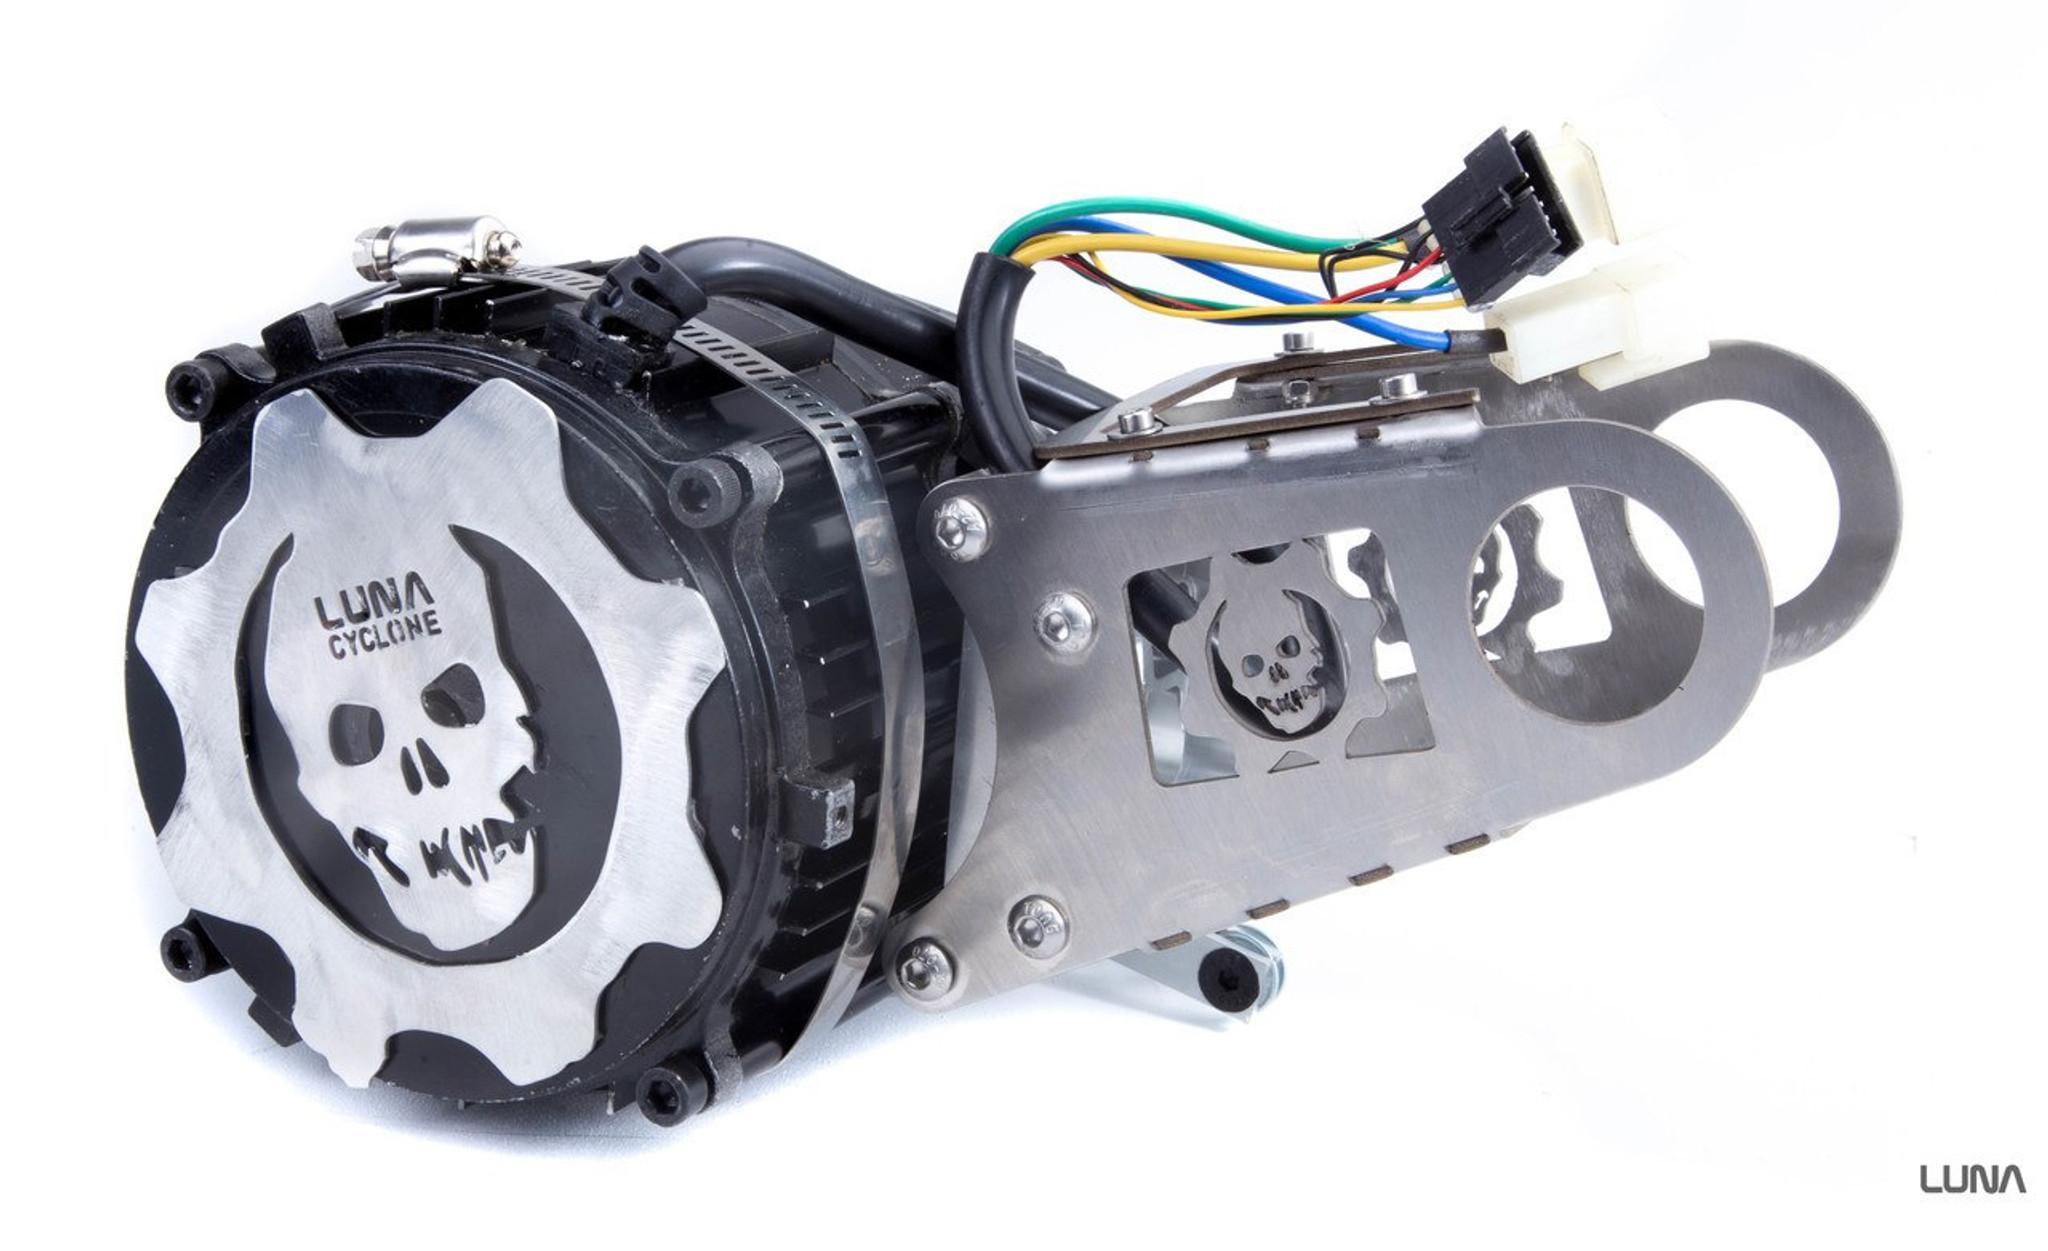 40aca02fb60 Cyclone Mid Drive 3000 watt Planetary Ebike KIT - Luna Cycle